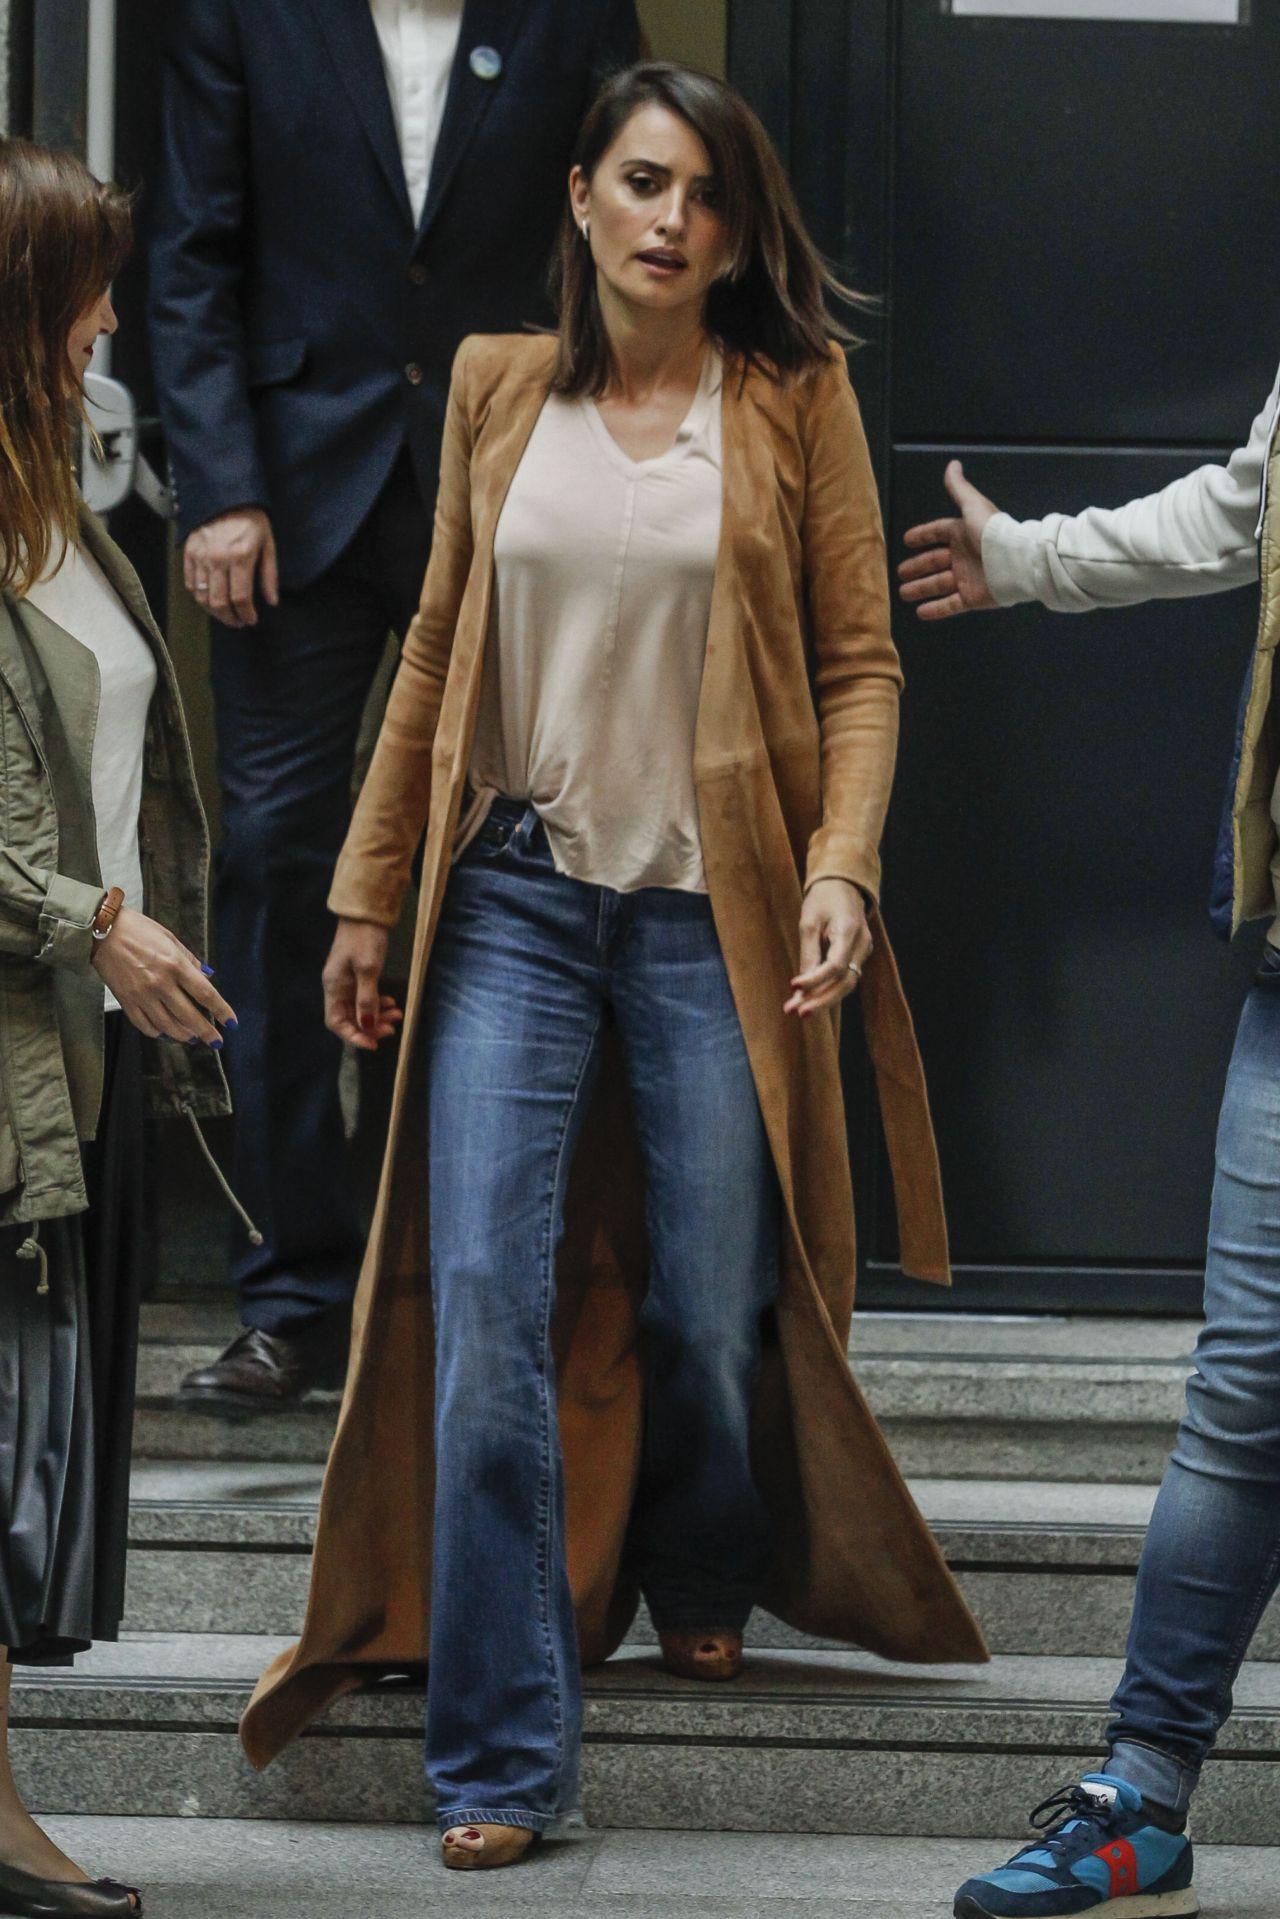 Penelope Cruz Street Style | Foundation Grants